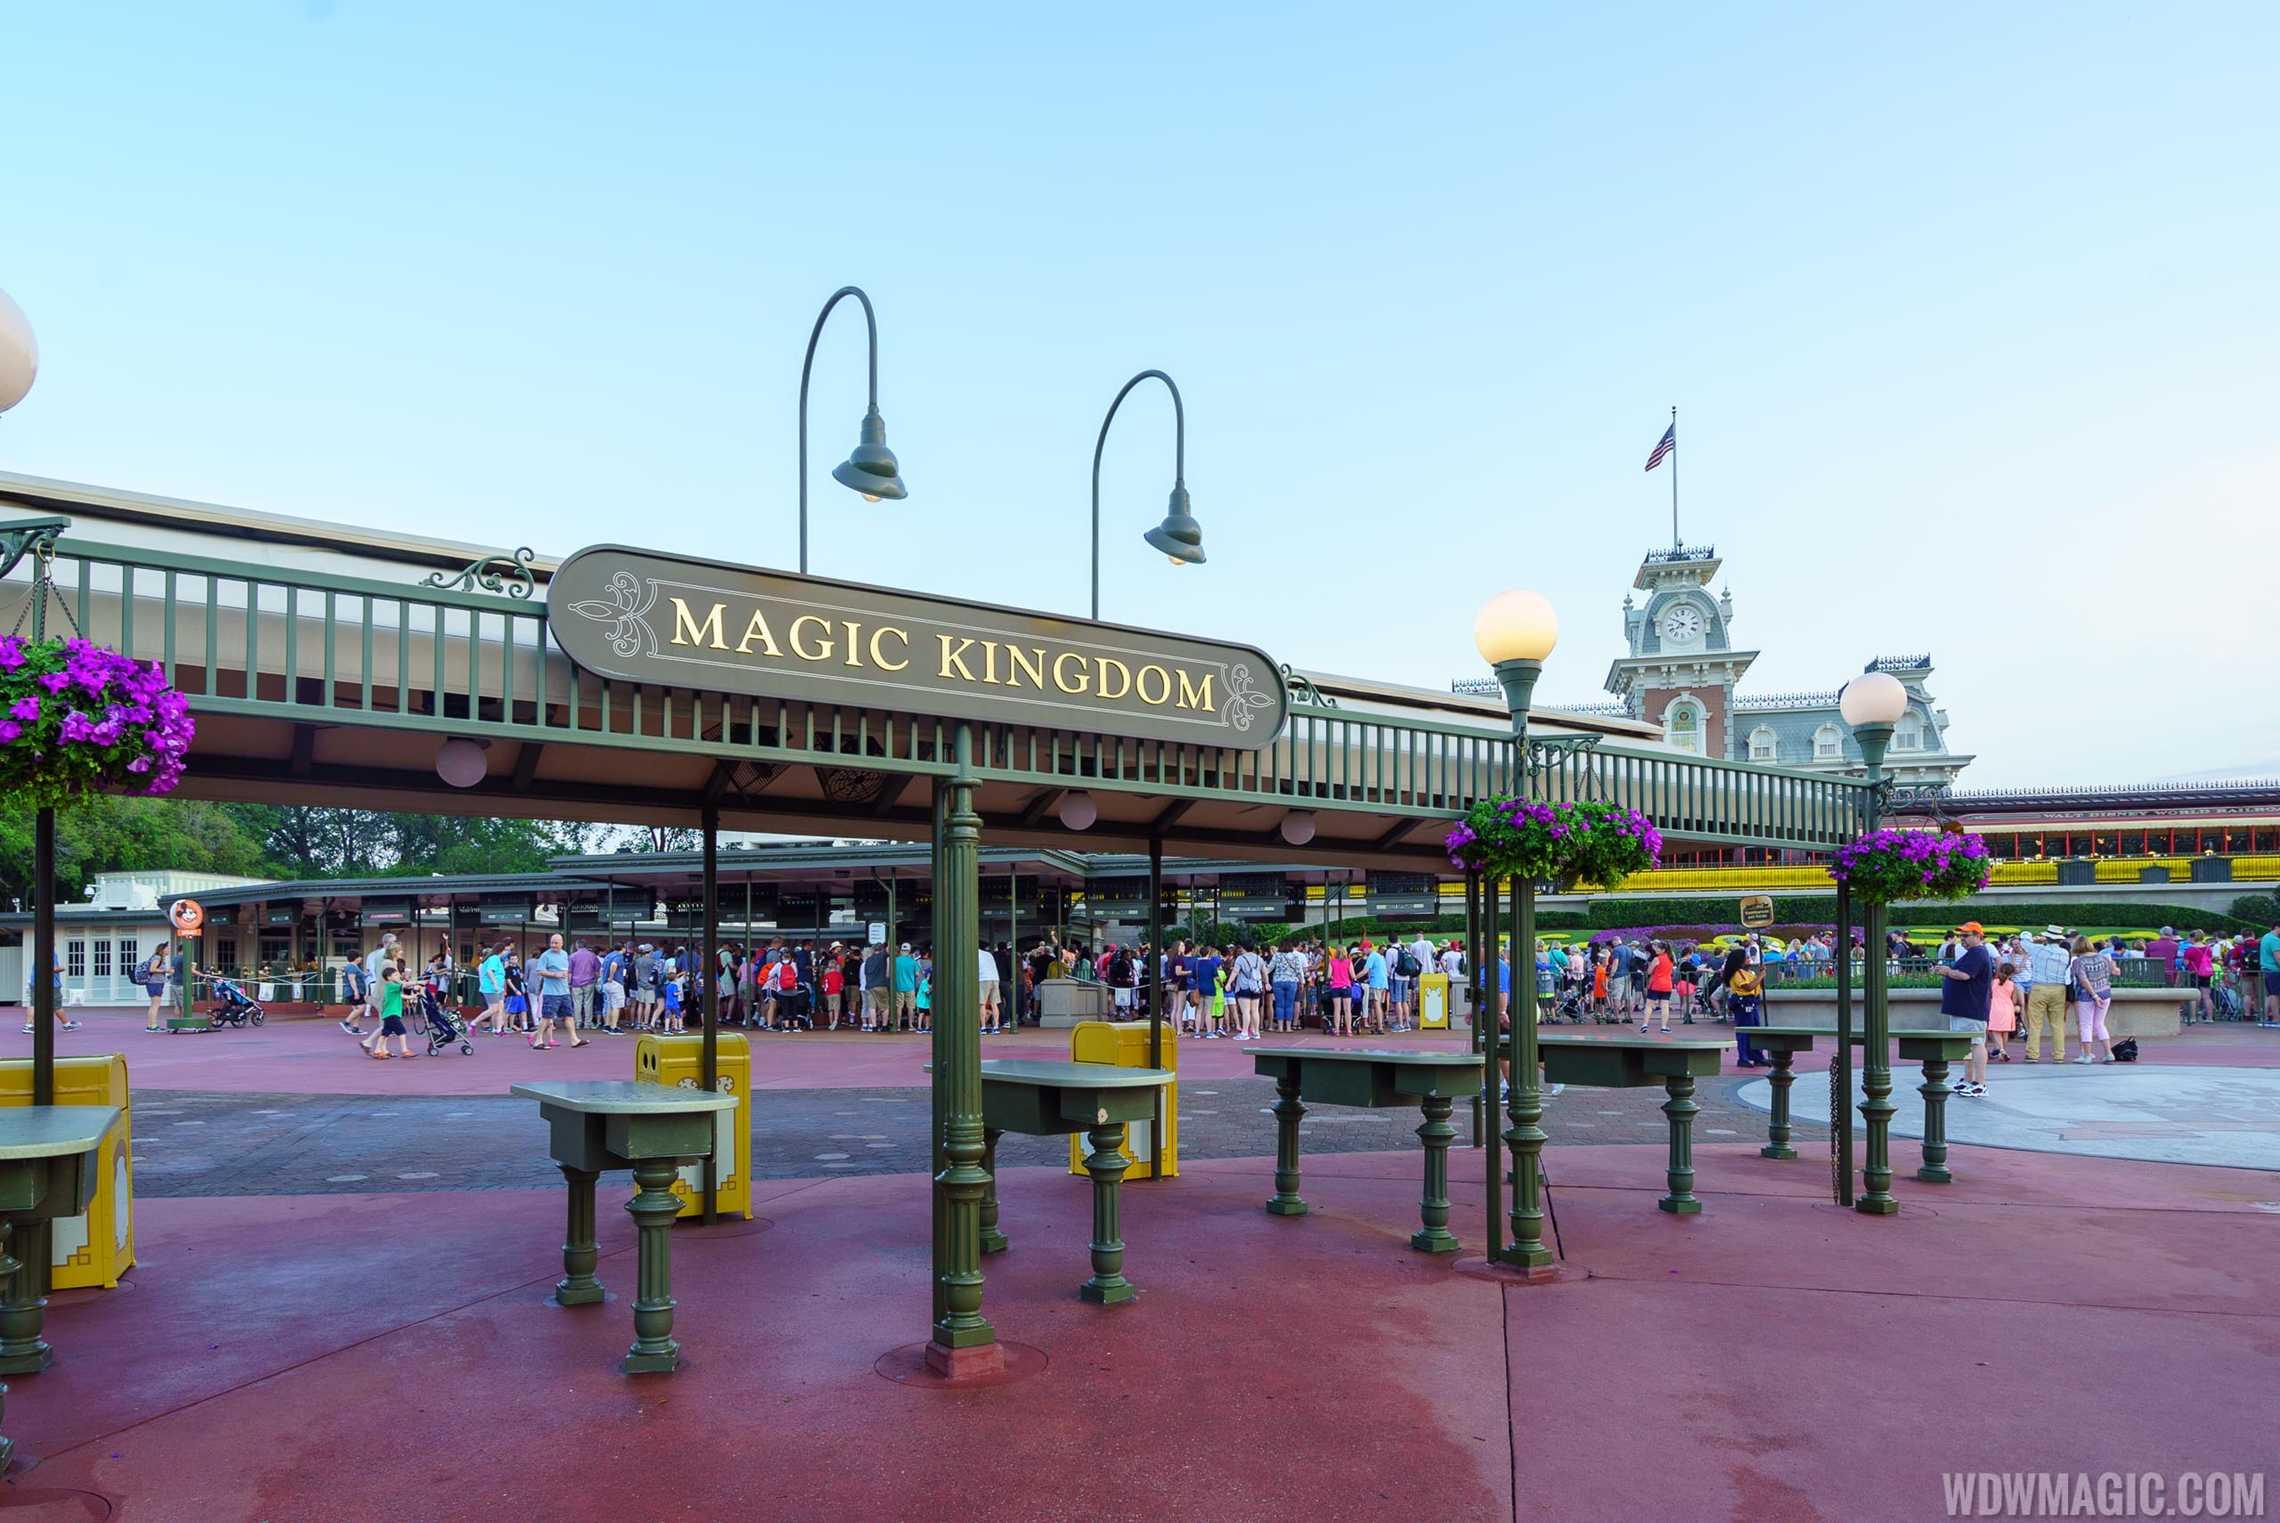 Magic Kingdom entrance empty bag check area